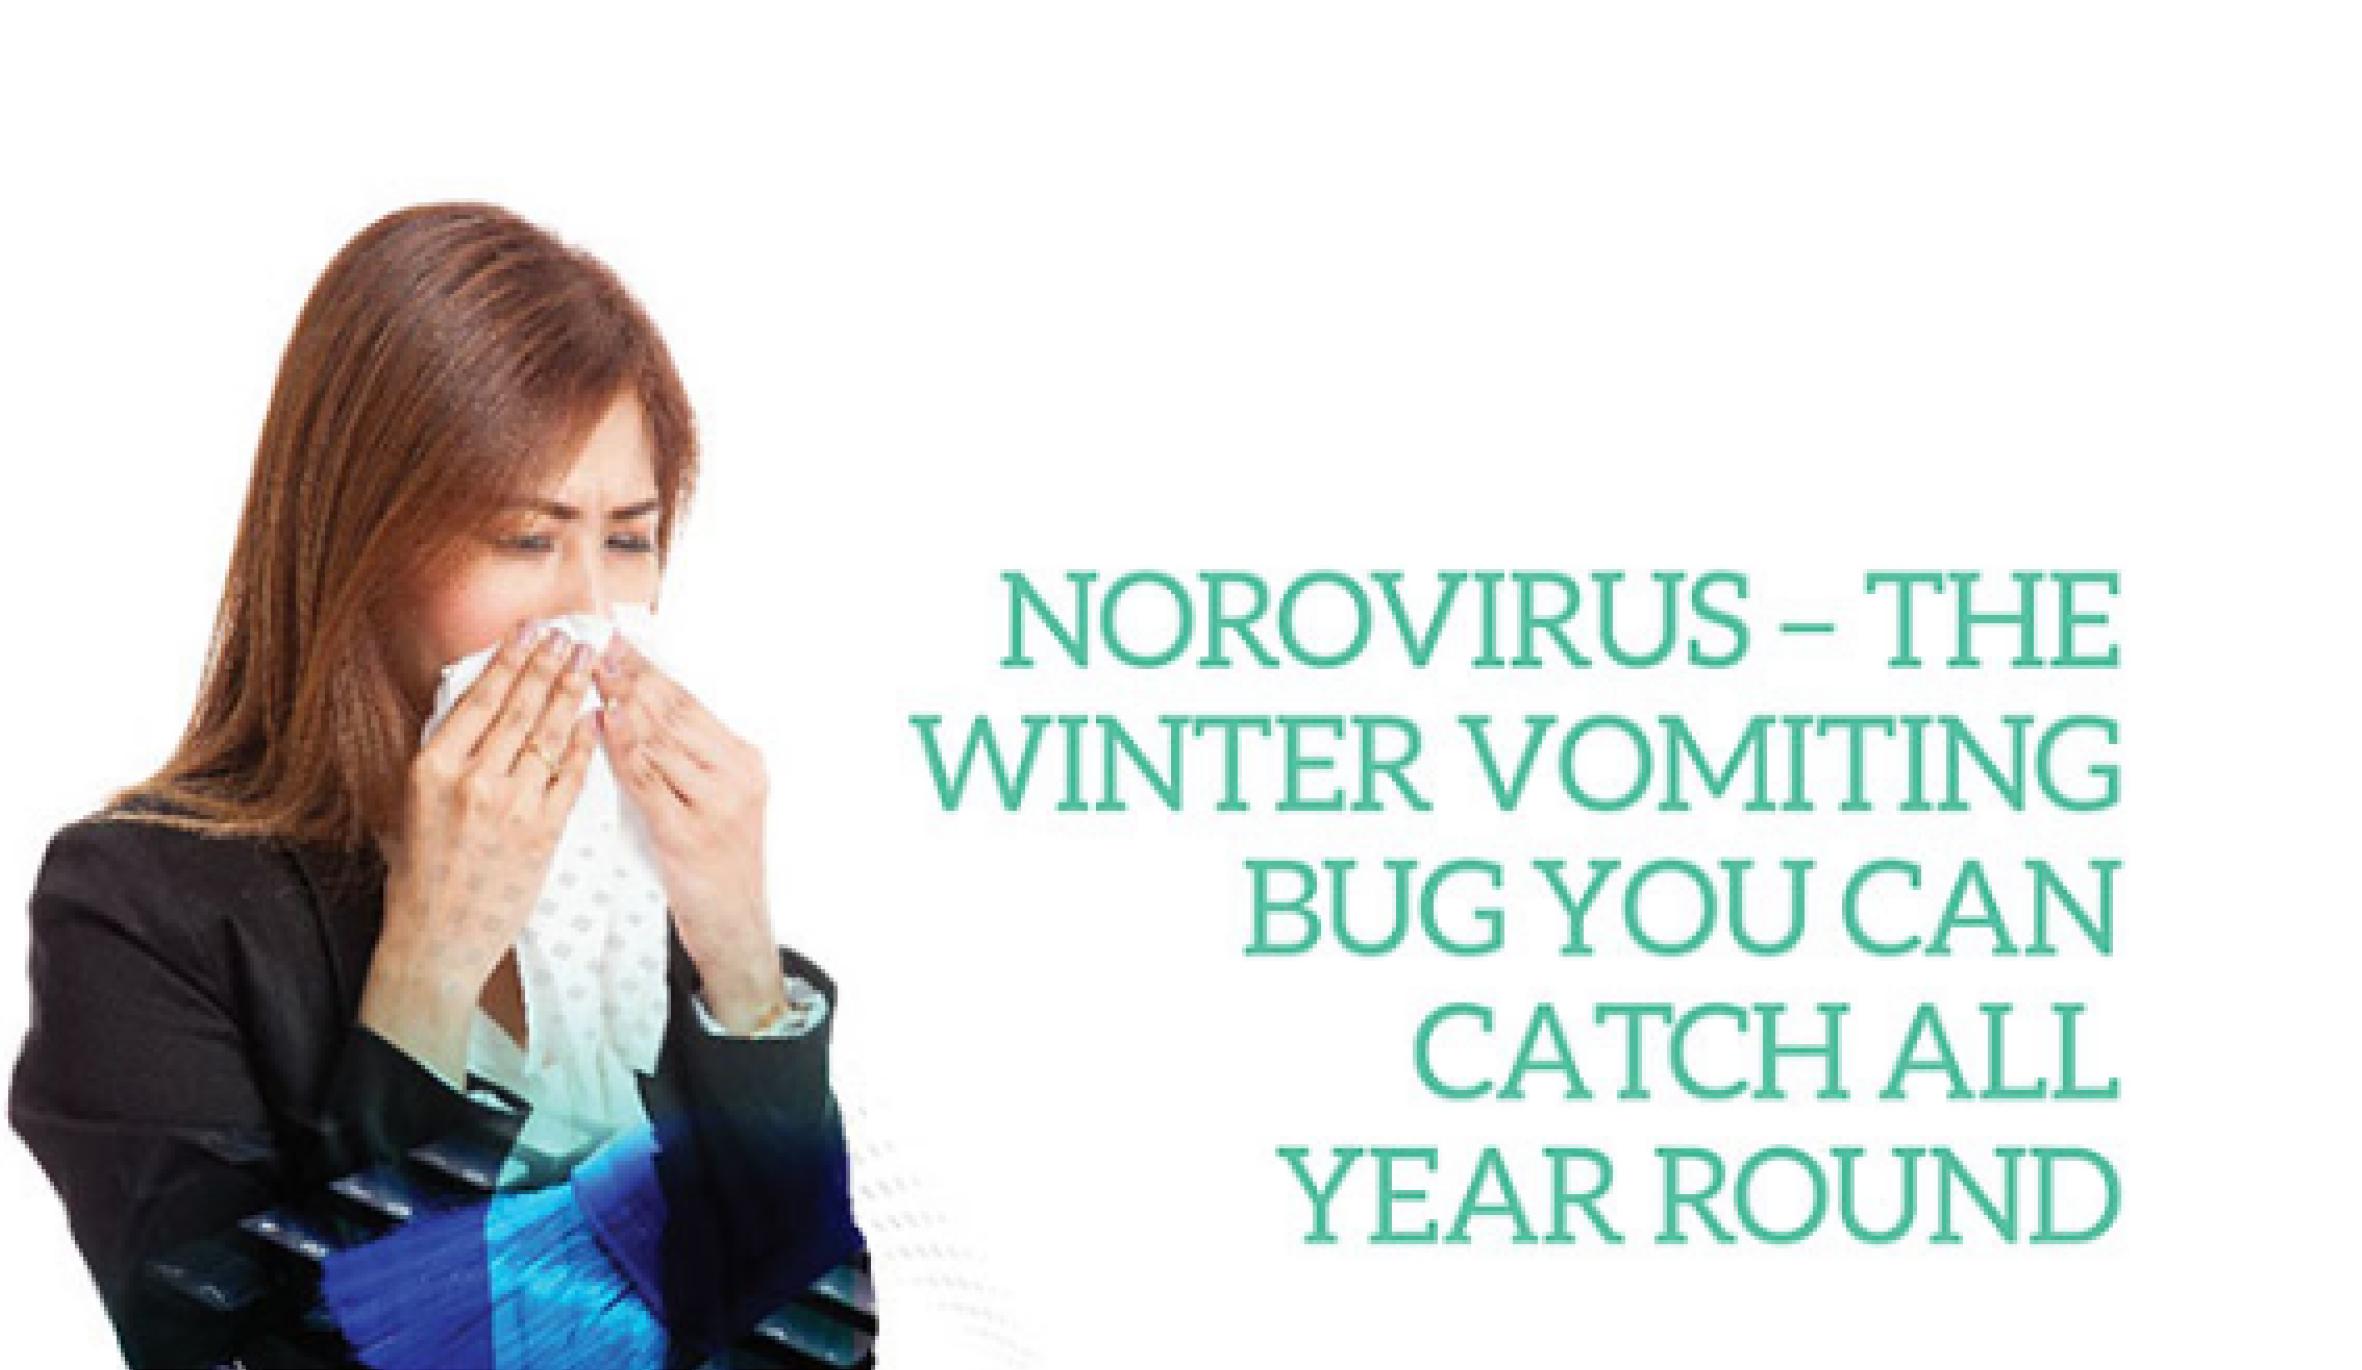 Techclean will help you avoid Norovirus